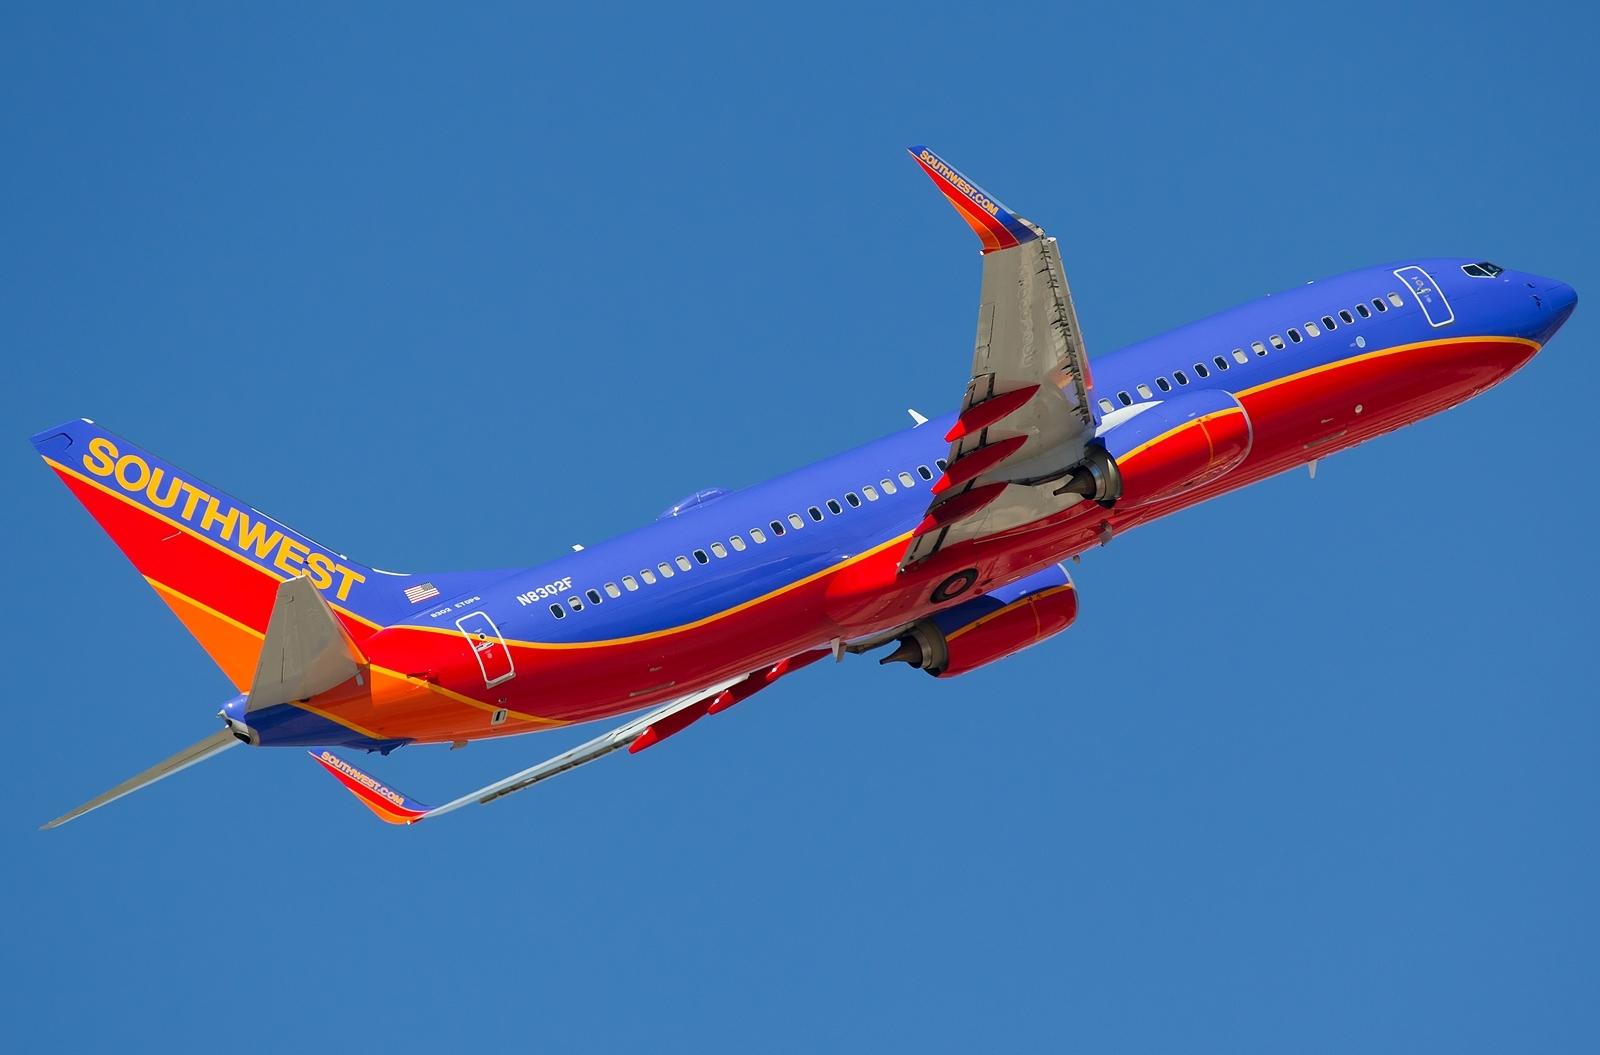 http://1.bp.blogspot.com/-qnWSMwrZHe8/UUkB5ImerII/AAAAAAAAPoo/b8KS8fTDX9Y/s1600/boeing_737-800_southwest_airlines.jpg